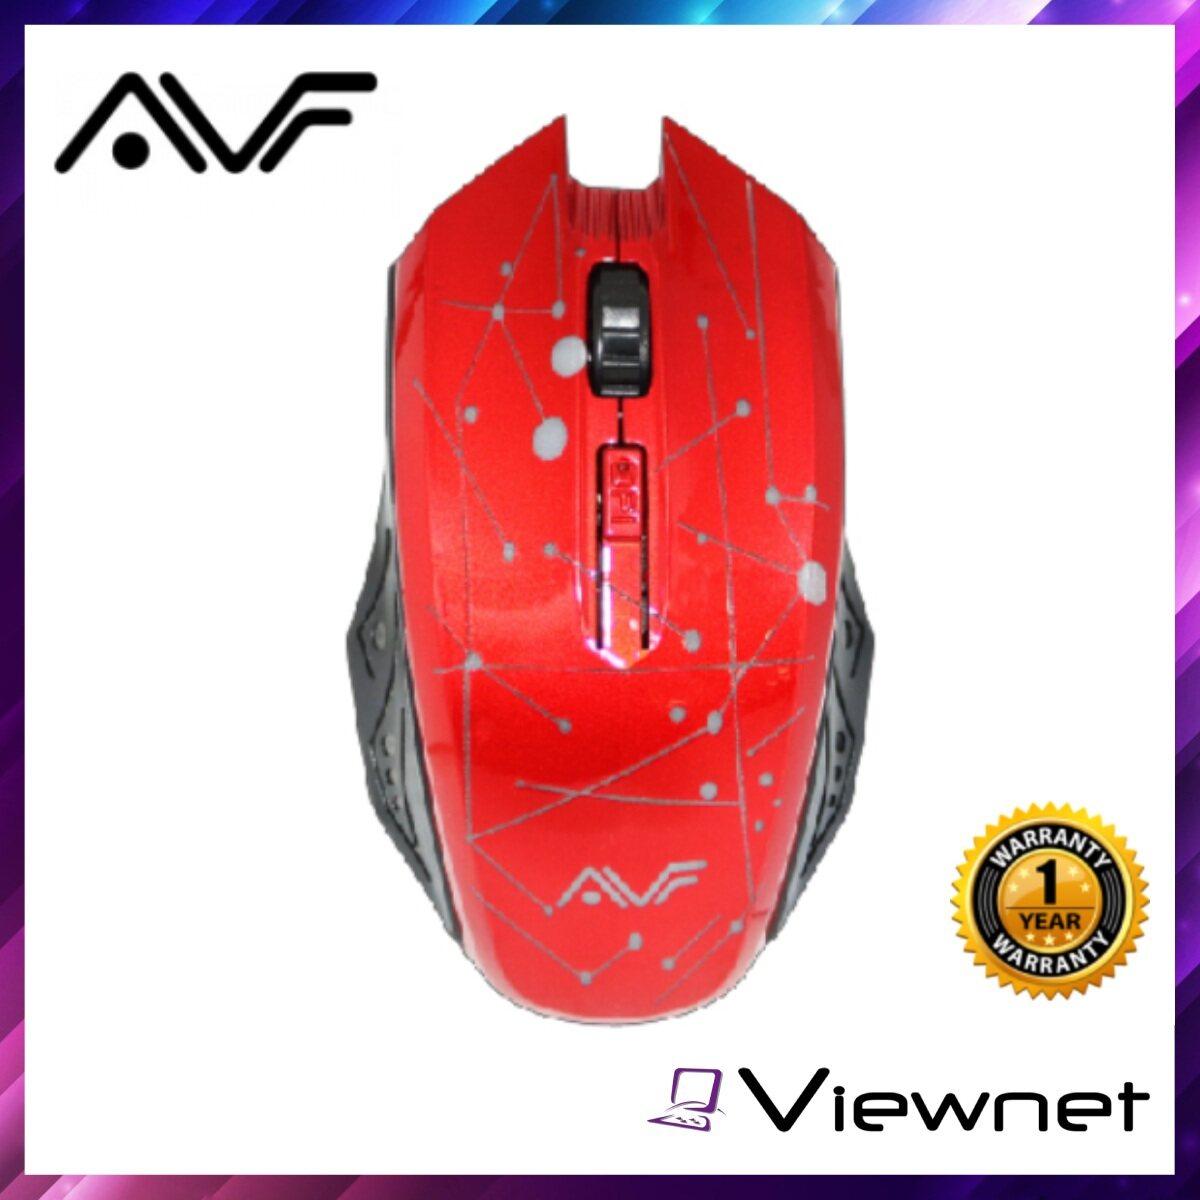 AVF AM6G Wireless Mouse, (AM6G), 1600DPI, USB Nano Receiver, 2.4GHz Wireless Technology